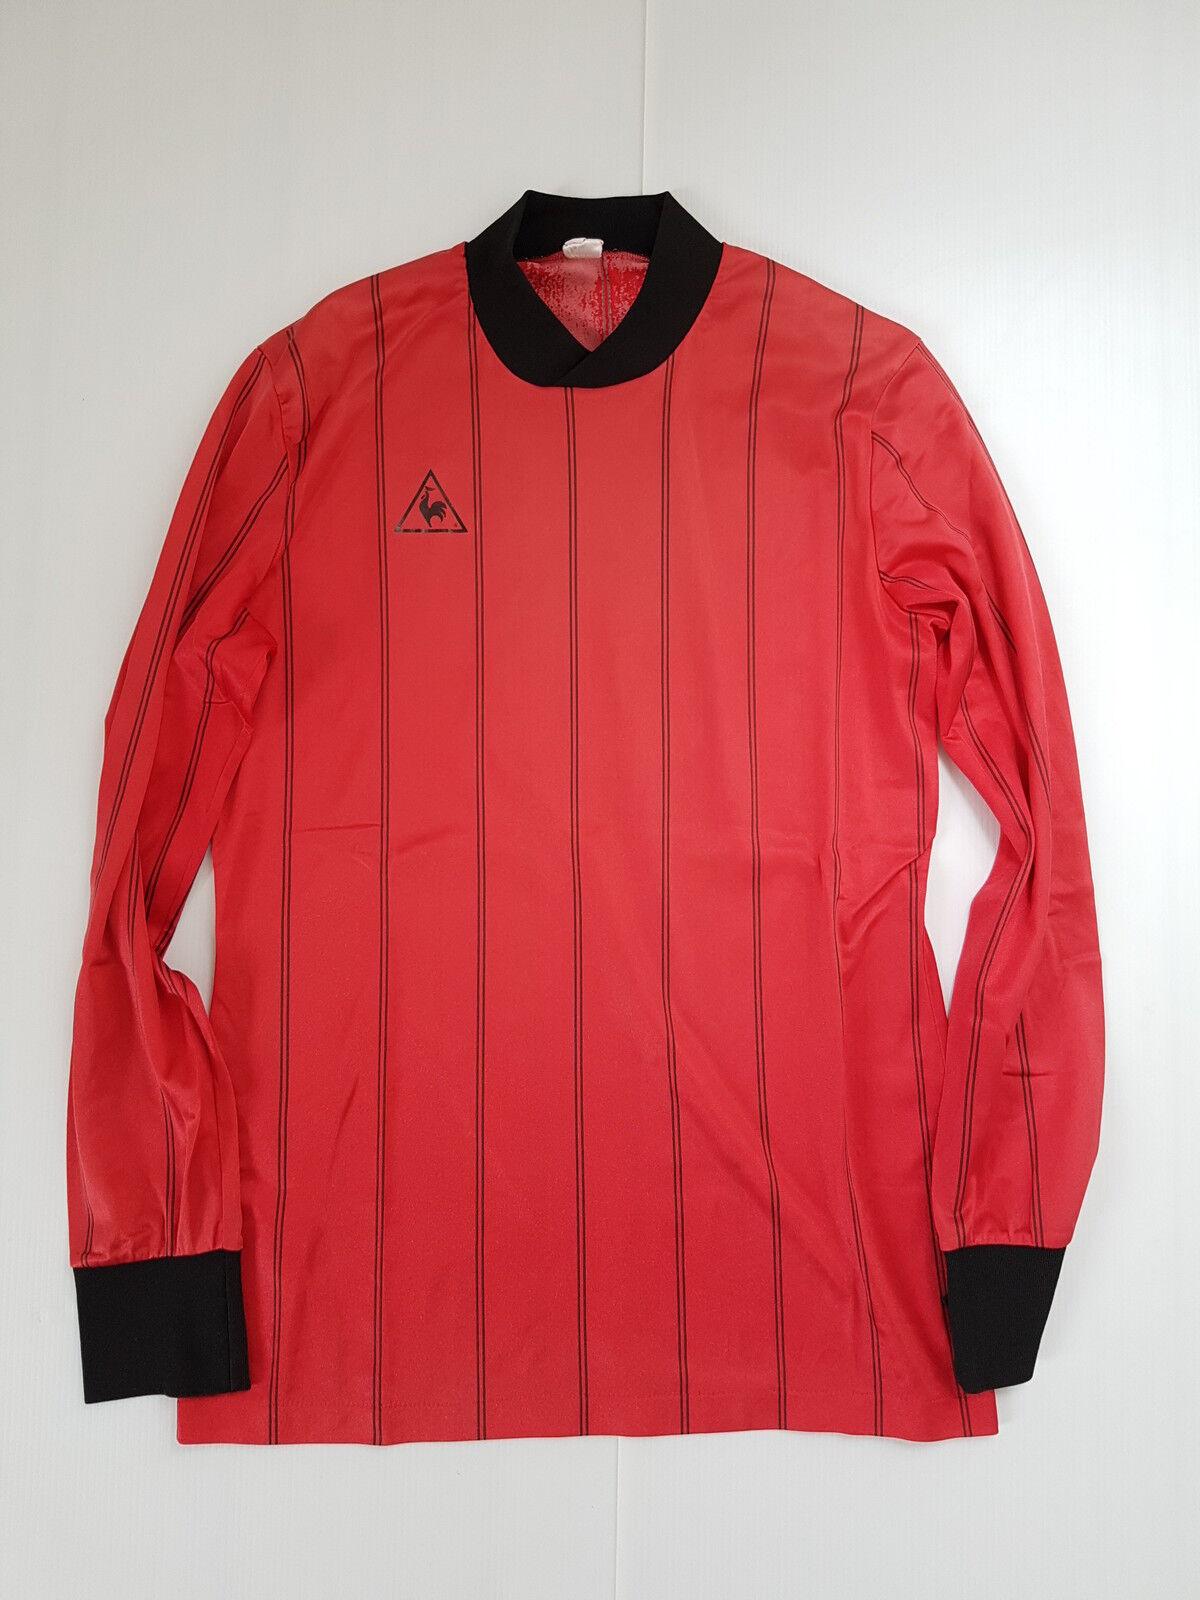 Soccer Jersey Shirt Old Vintage Maglia Coq Sportif 2x3 No. 5